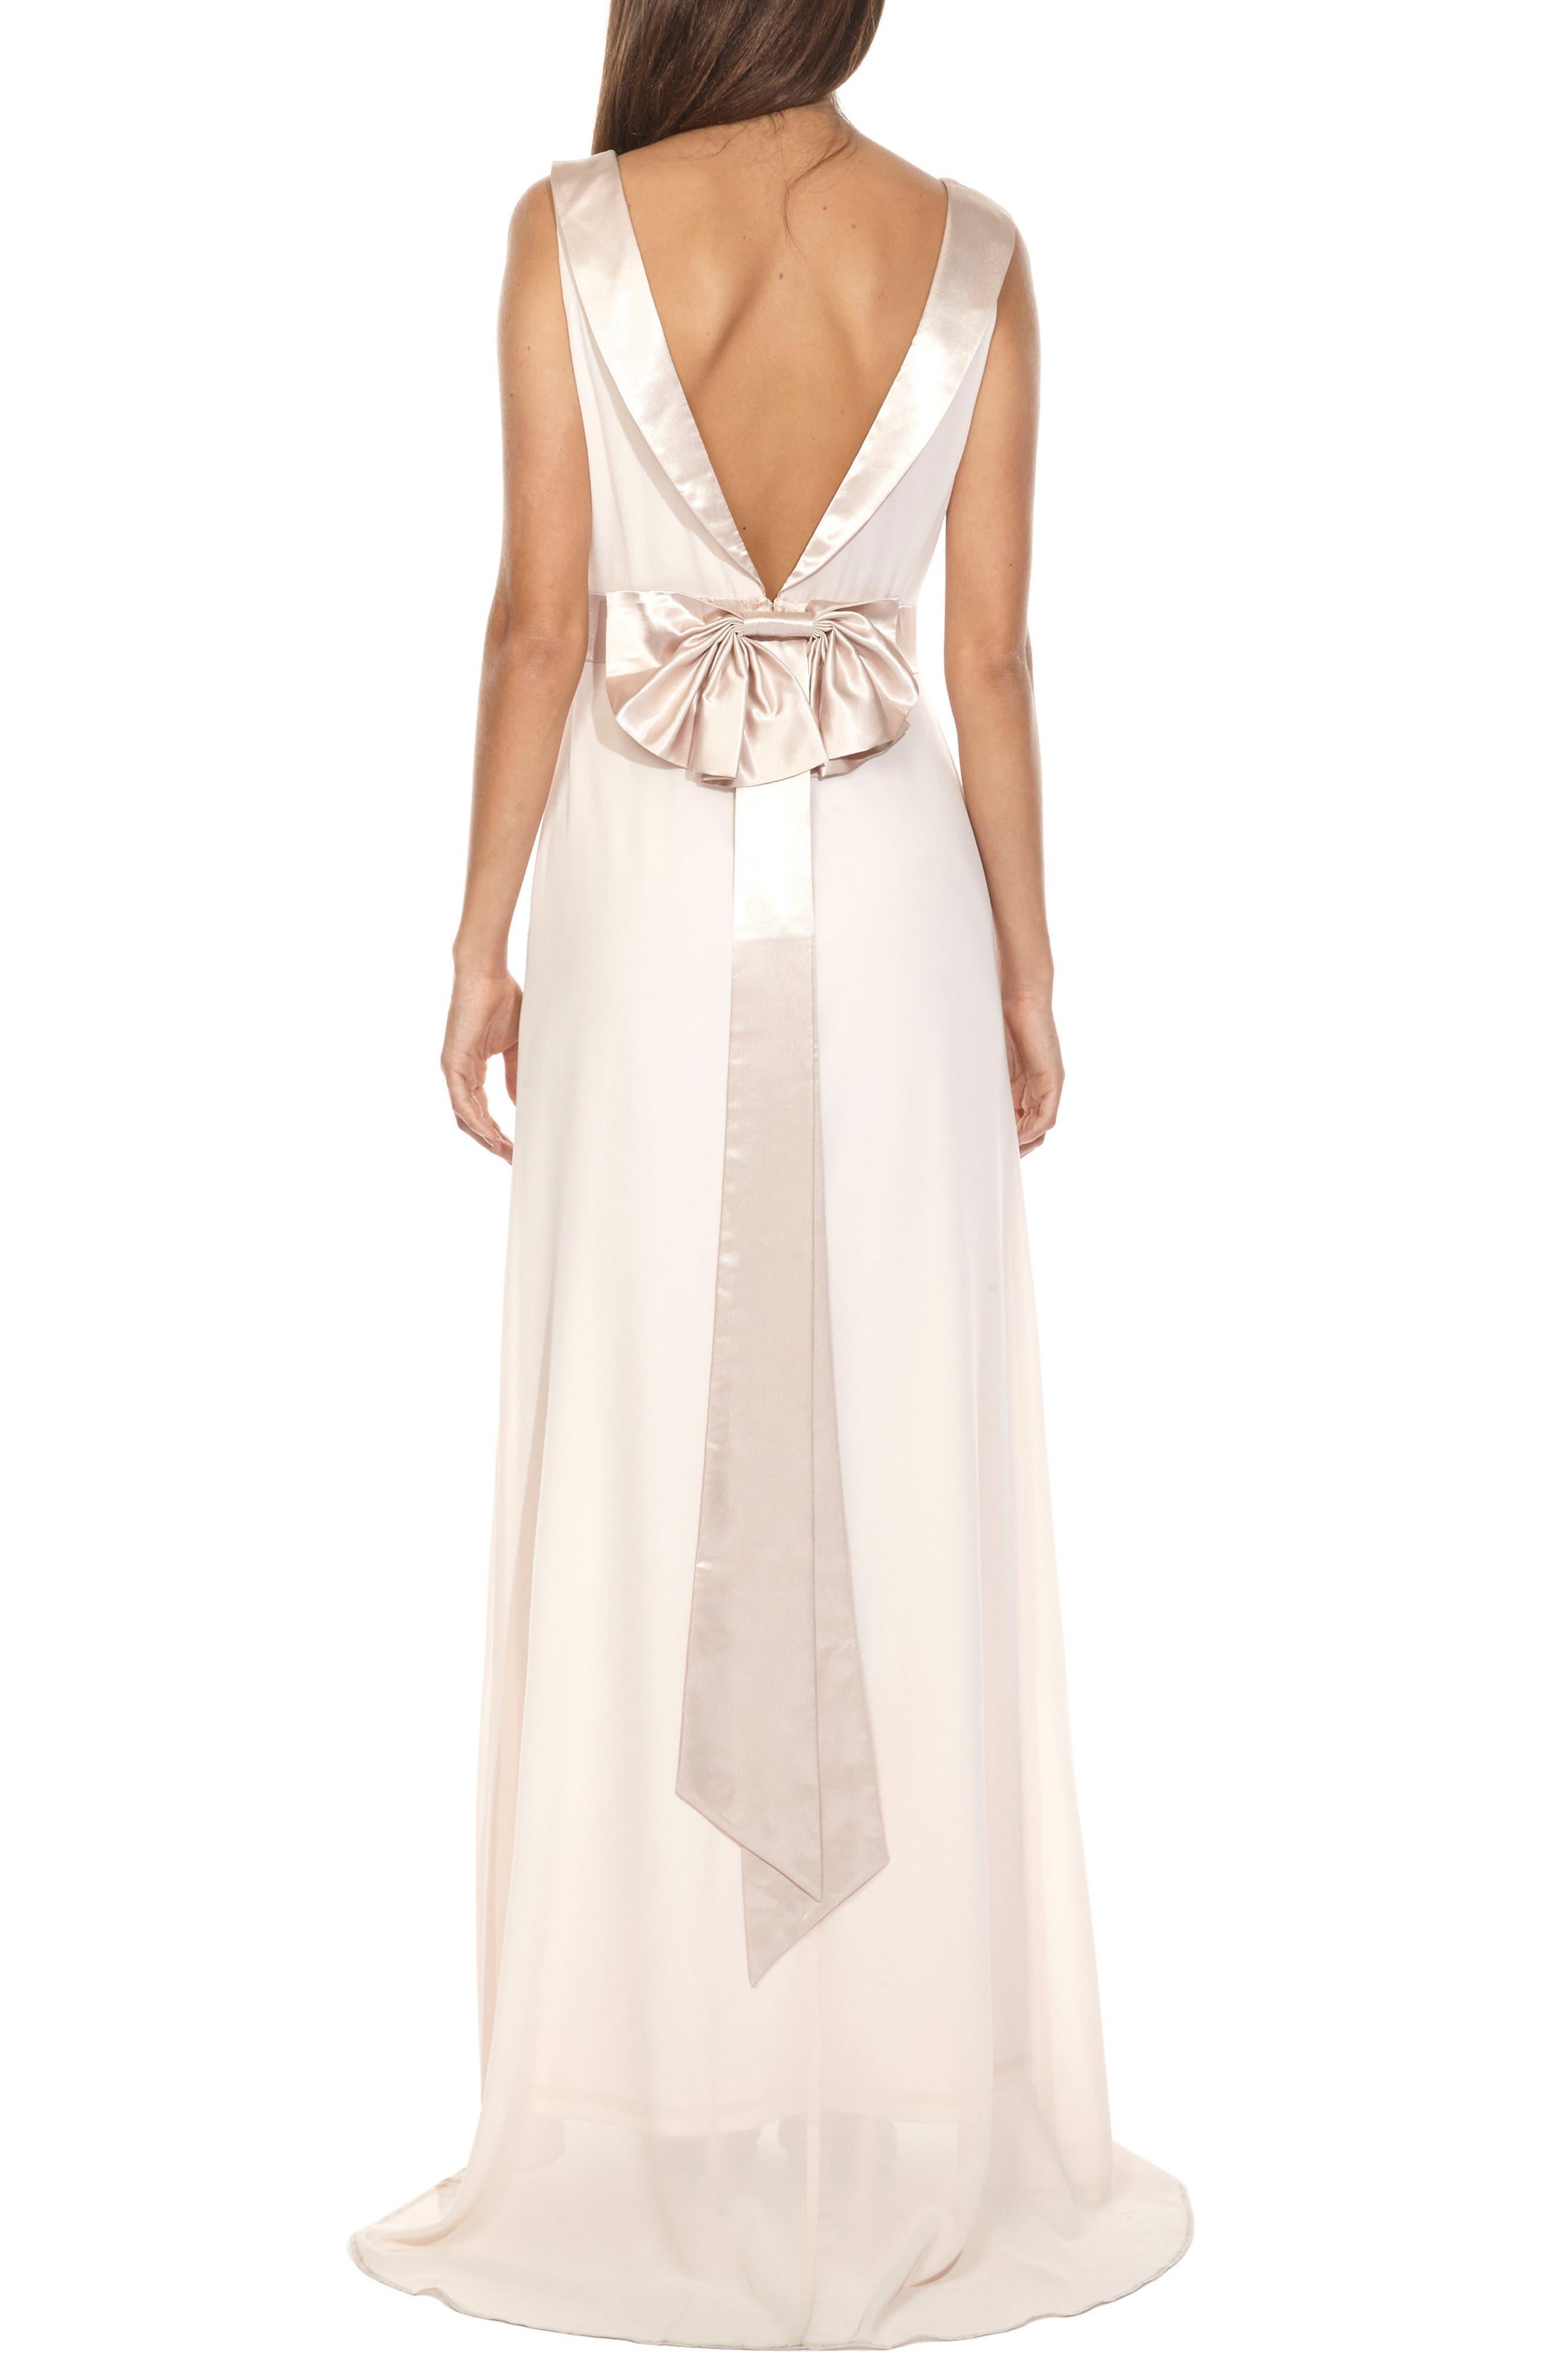 Daralls V-Back Maxi Dress,                             Alternate thumbnail 2, color,                             280